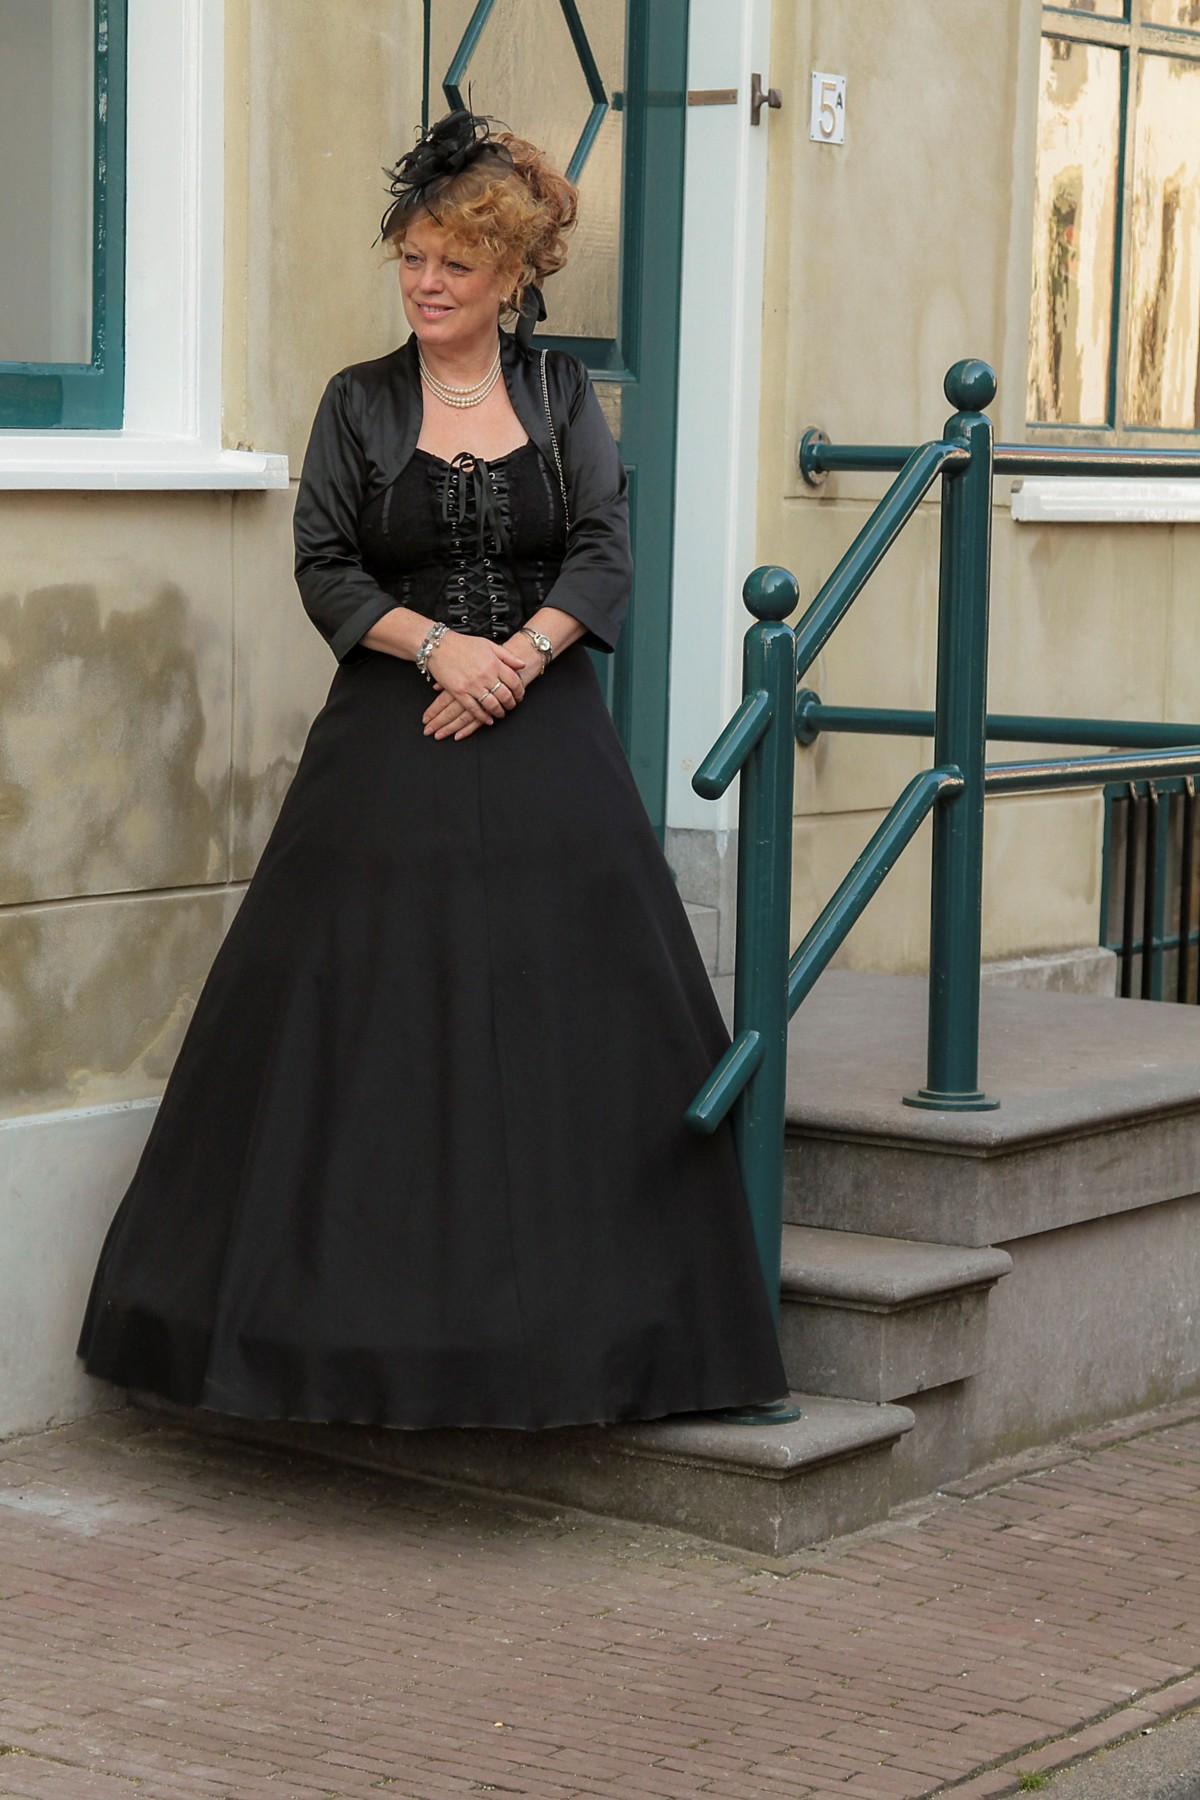 wanita antik model musim semi mode pakaian